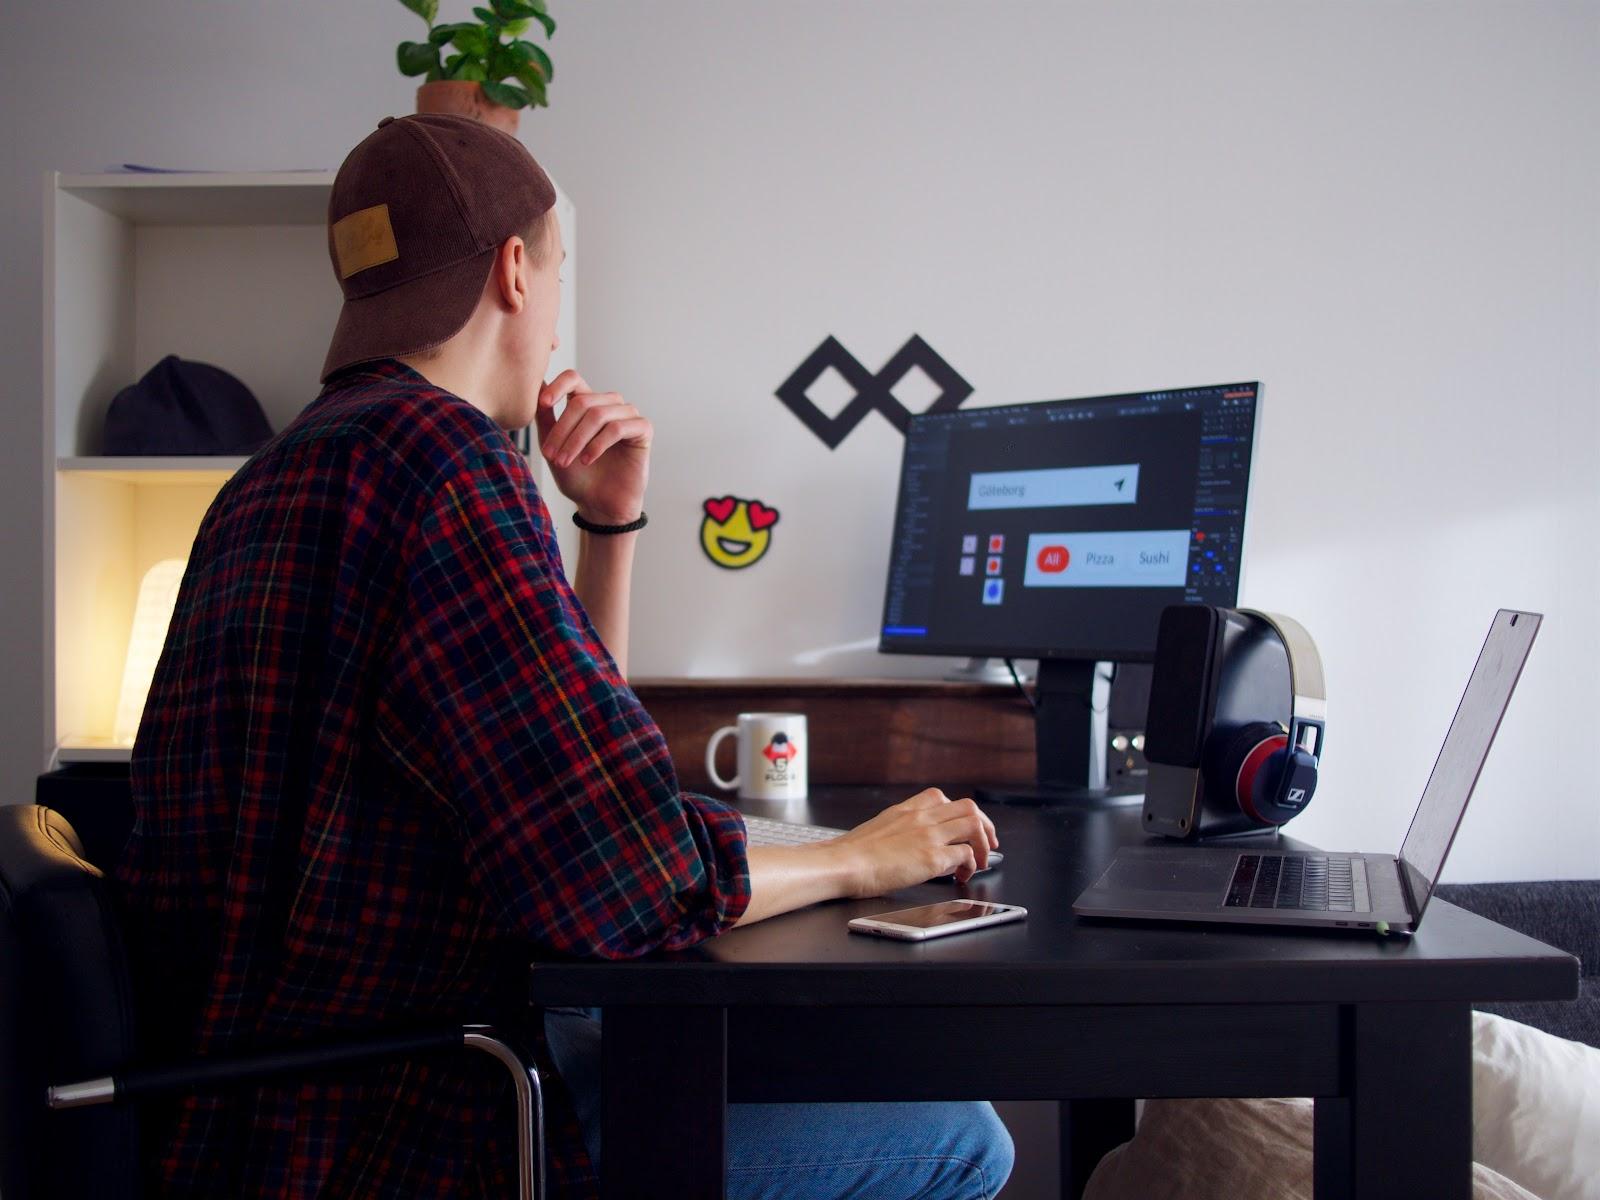 web designer guy making graphics